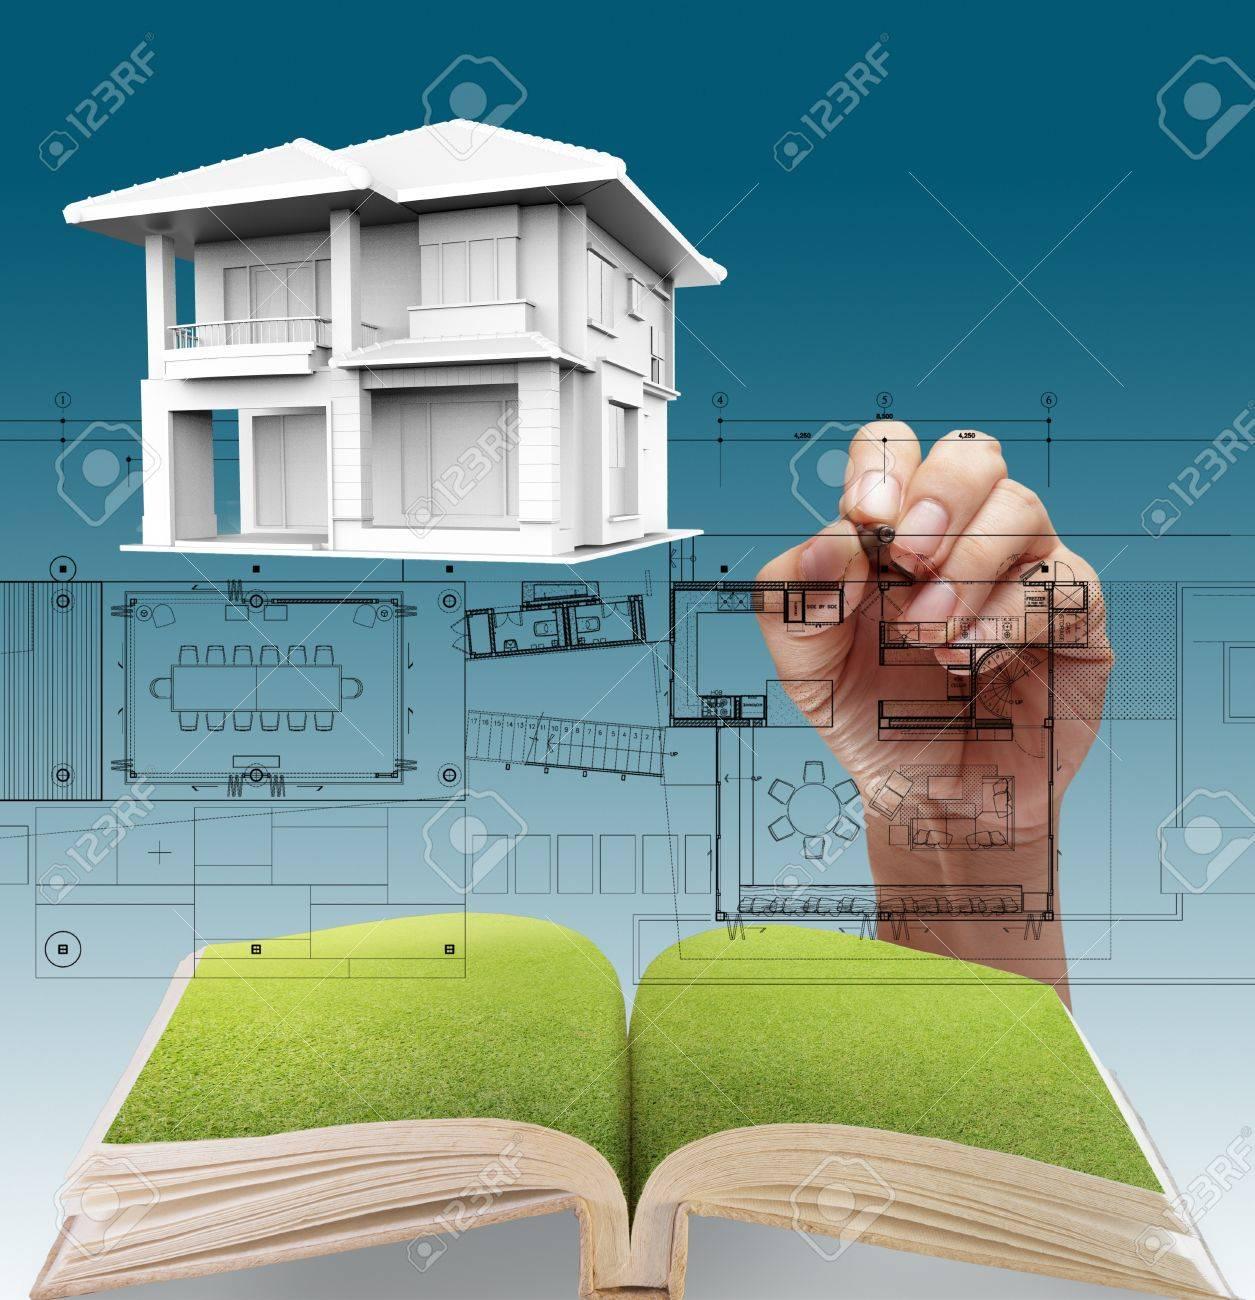 House plan blueprints, designer's hand - 16097326